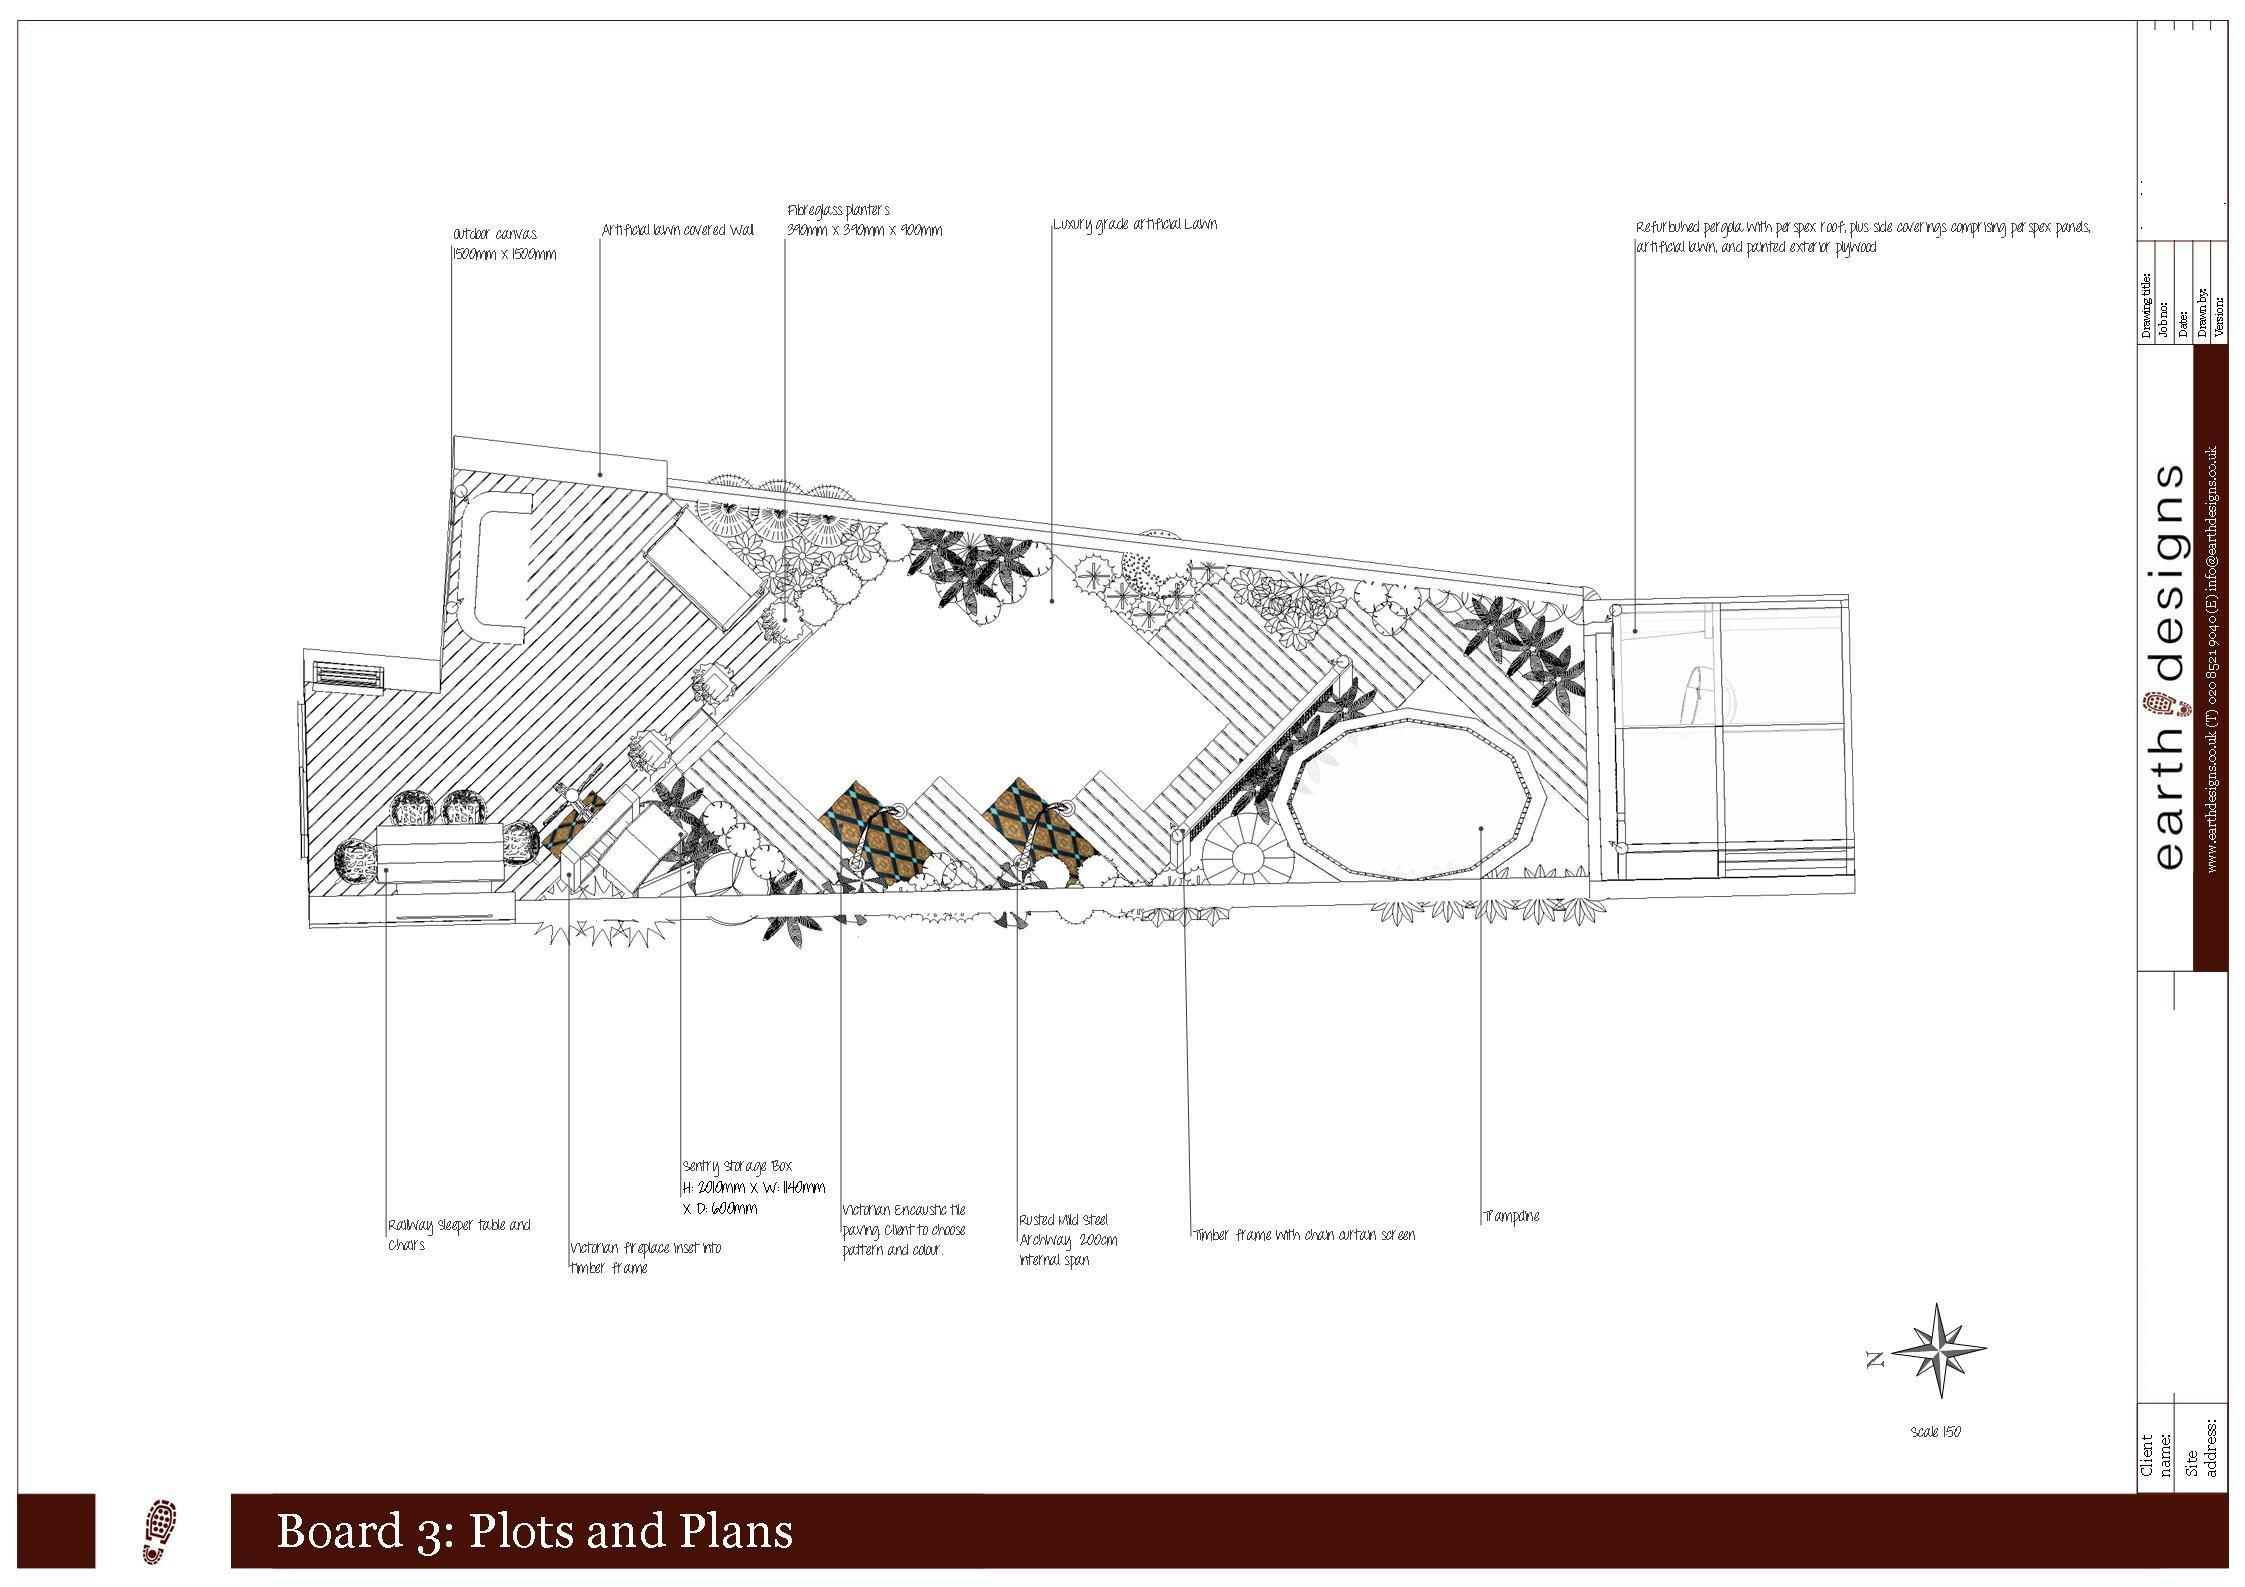 Garden Layouts What Suits My Plot Earth Designs Garden Design